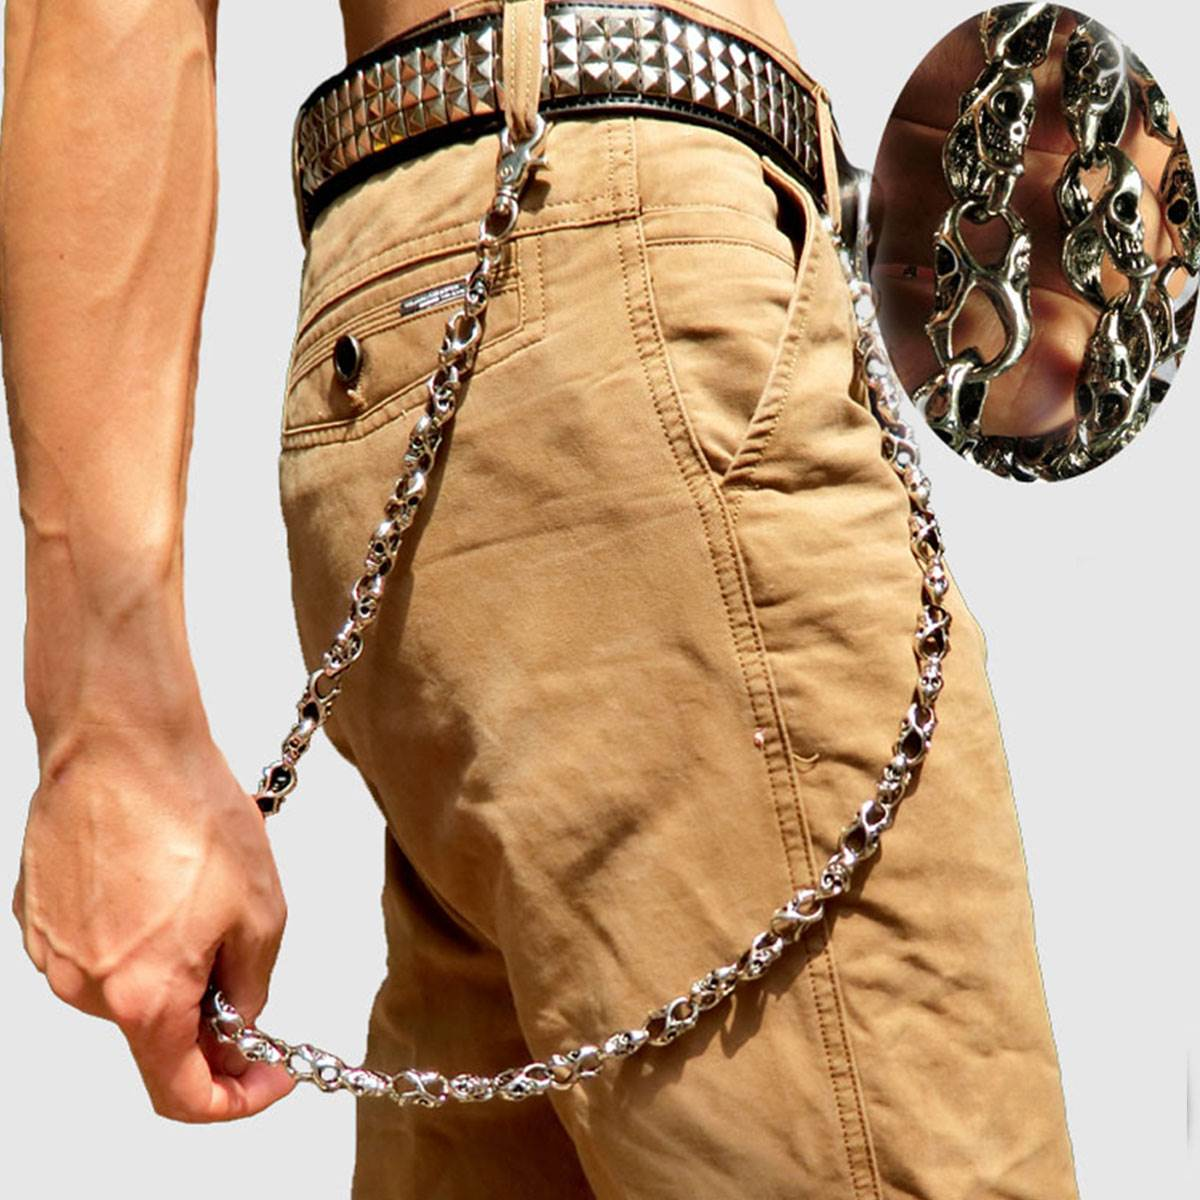 79cm Skull Biker Jean Wallet Chains Silver Ghost Rock Punk Metal Keychain Key Pant Chain Fashion Men Jewelry 2018